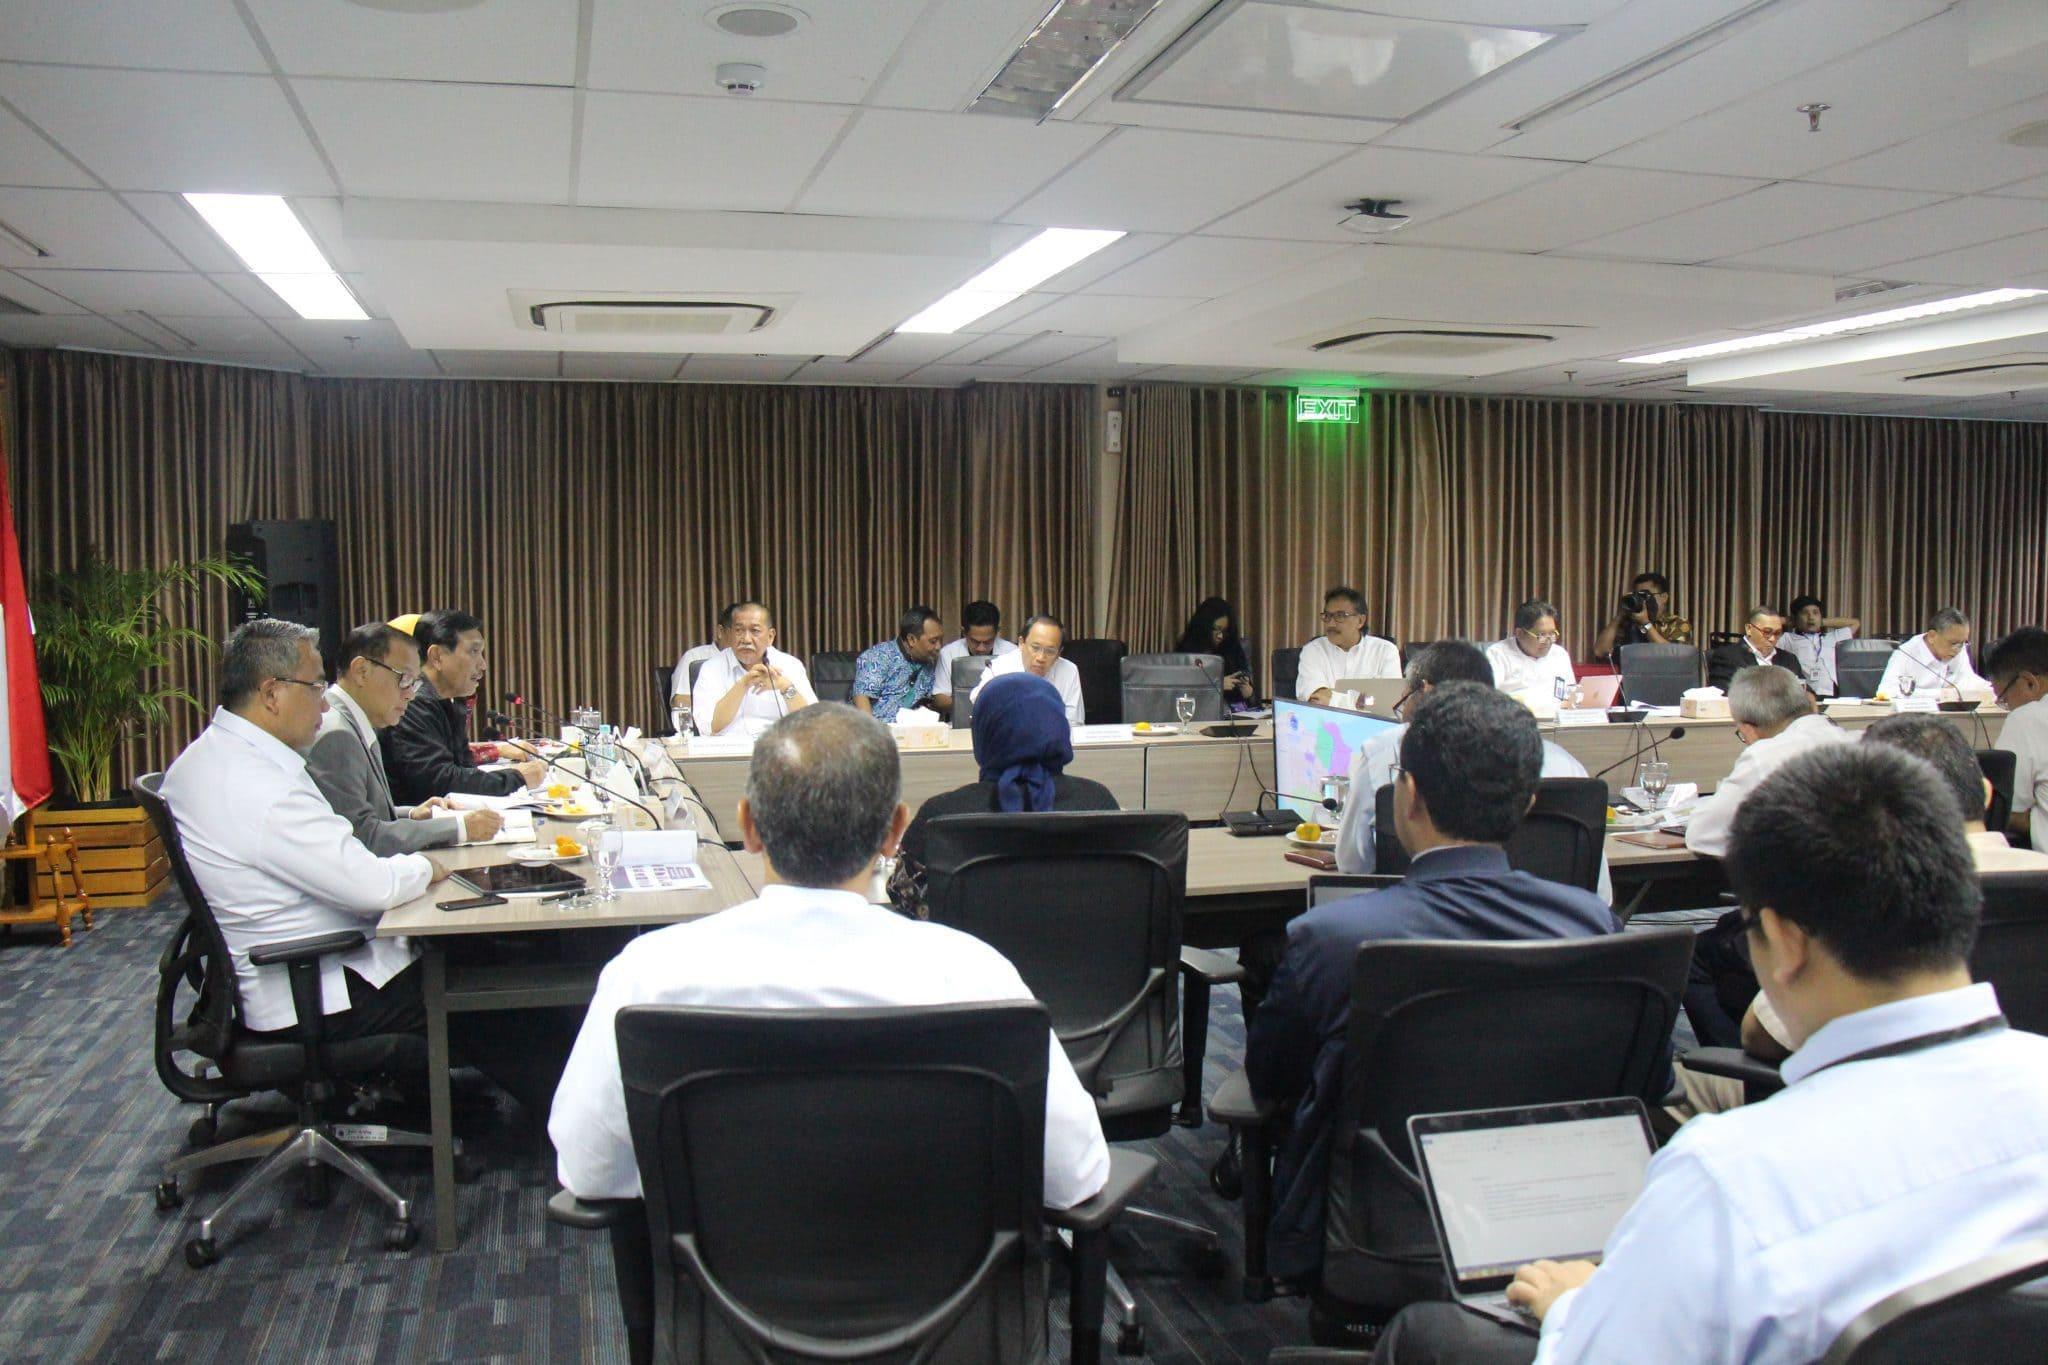 Menko Luhut pimpin Rapat Program Pembangunan & Pengentasan Kemiskinan di Wilayah Jawa Barat bagian Selatan